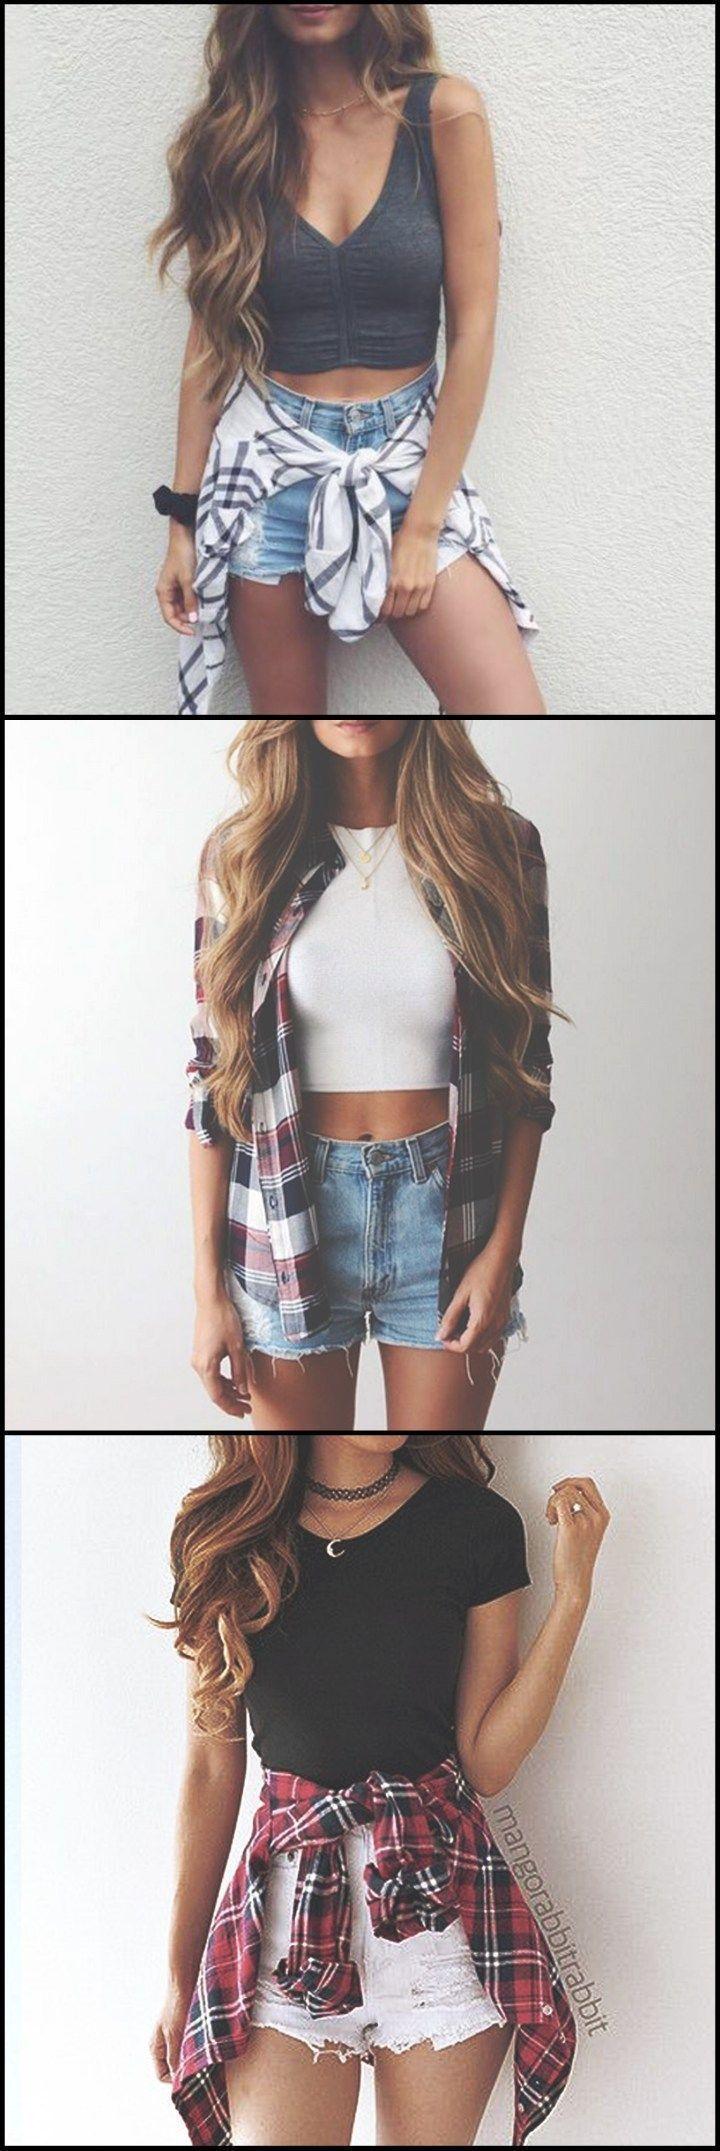 Süße Outfits Süße lässige Sommer-Outfit-Ideen für Teenager 2017 Flanell Plaid High #cuteoutfits